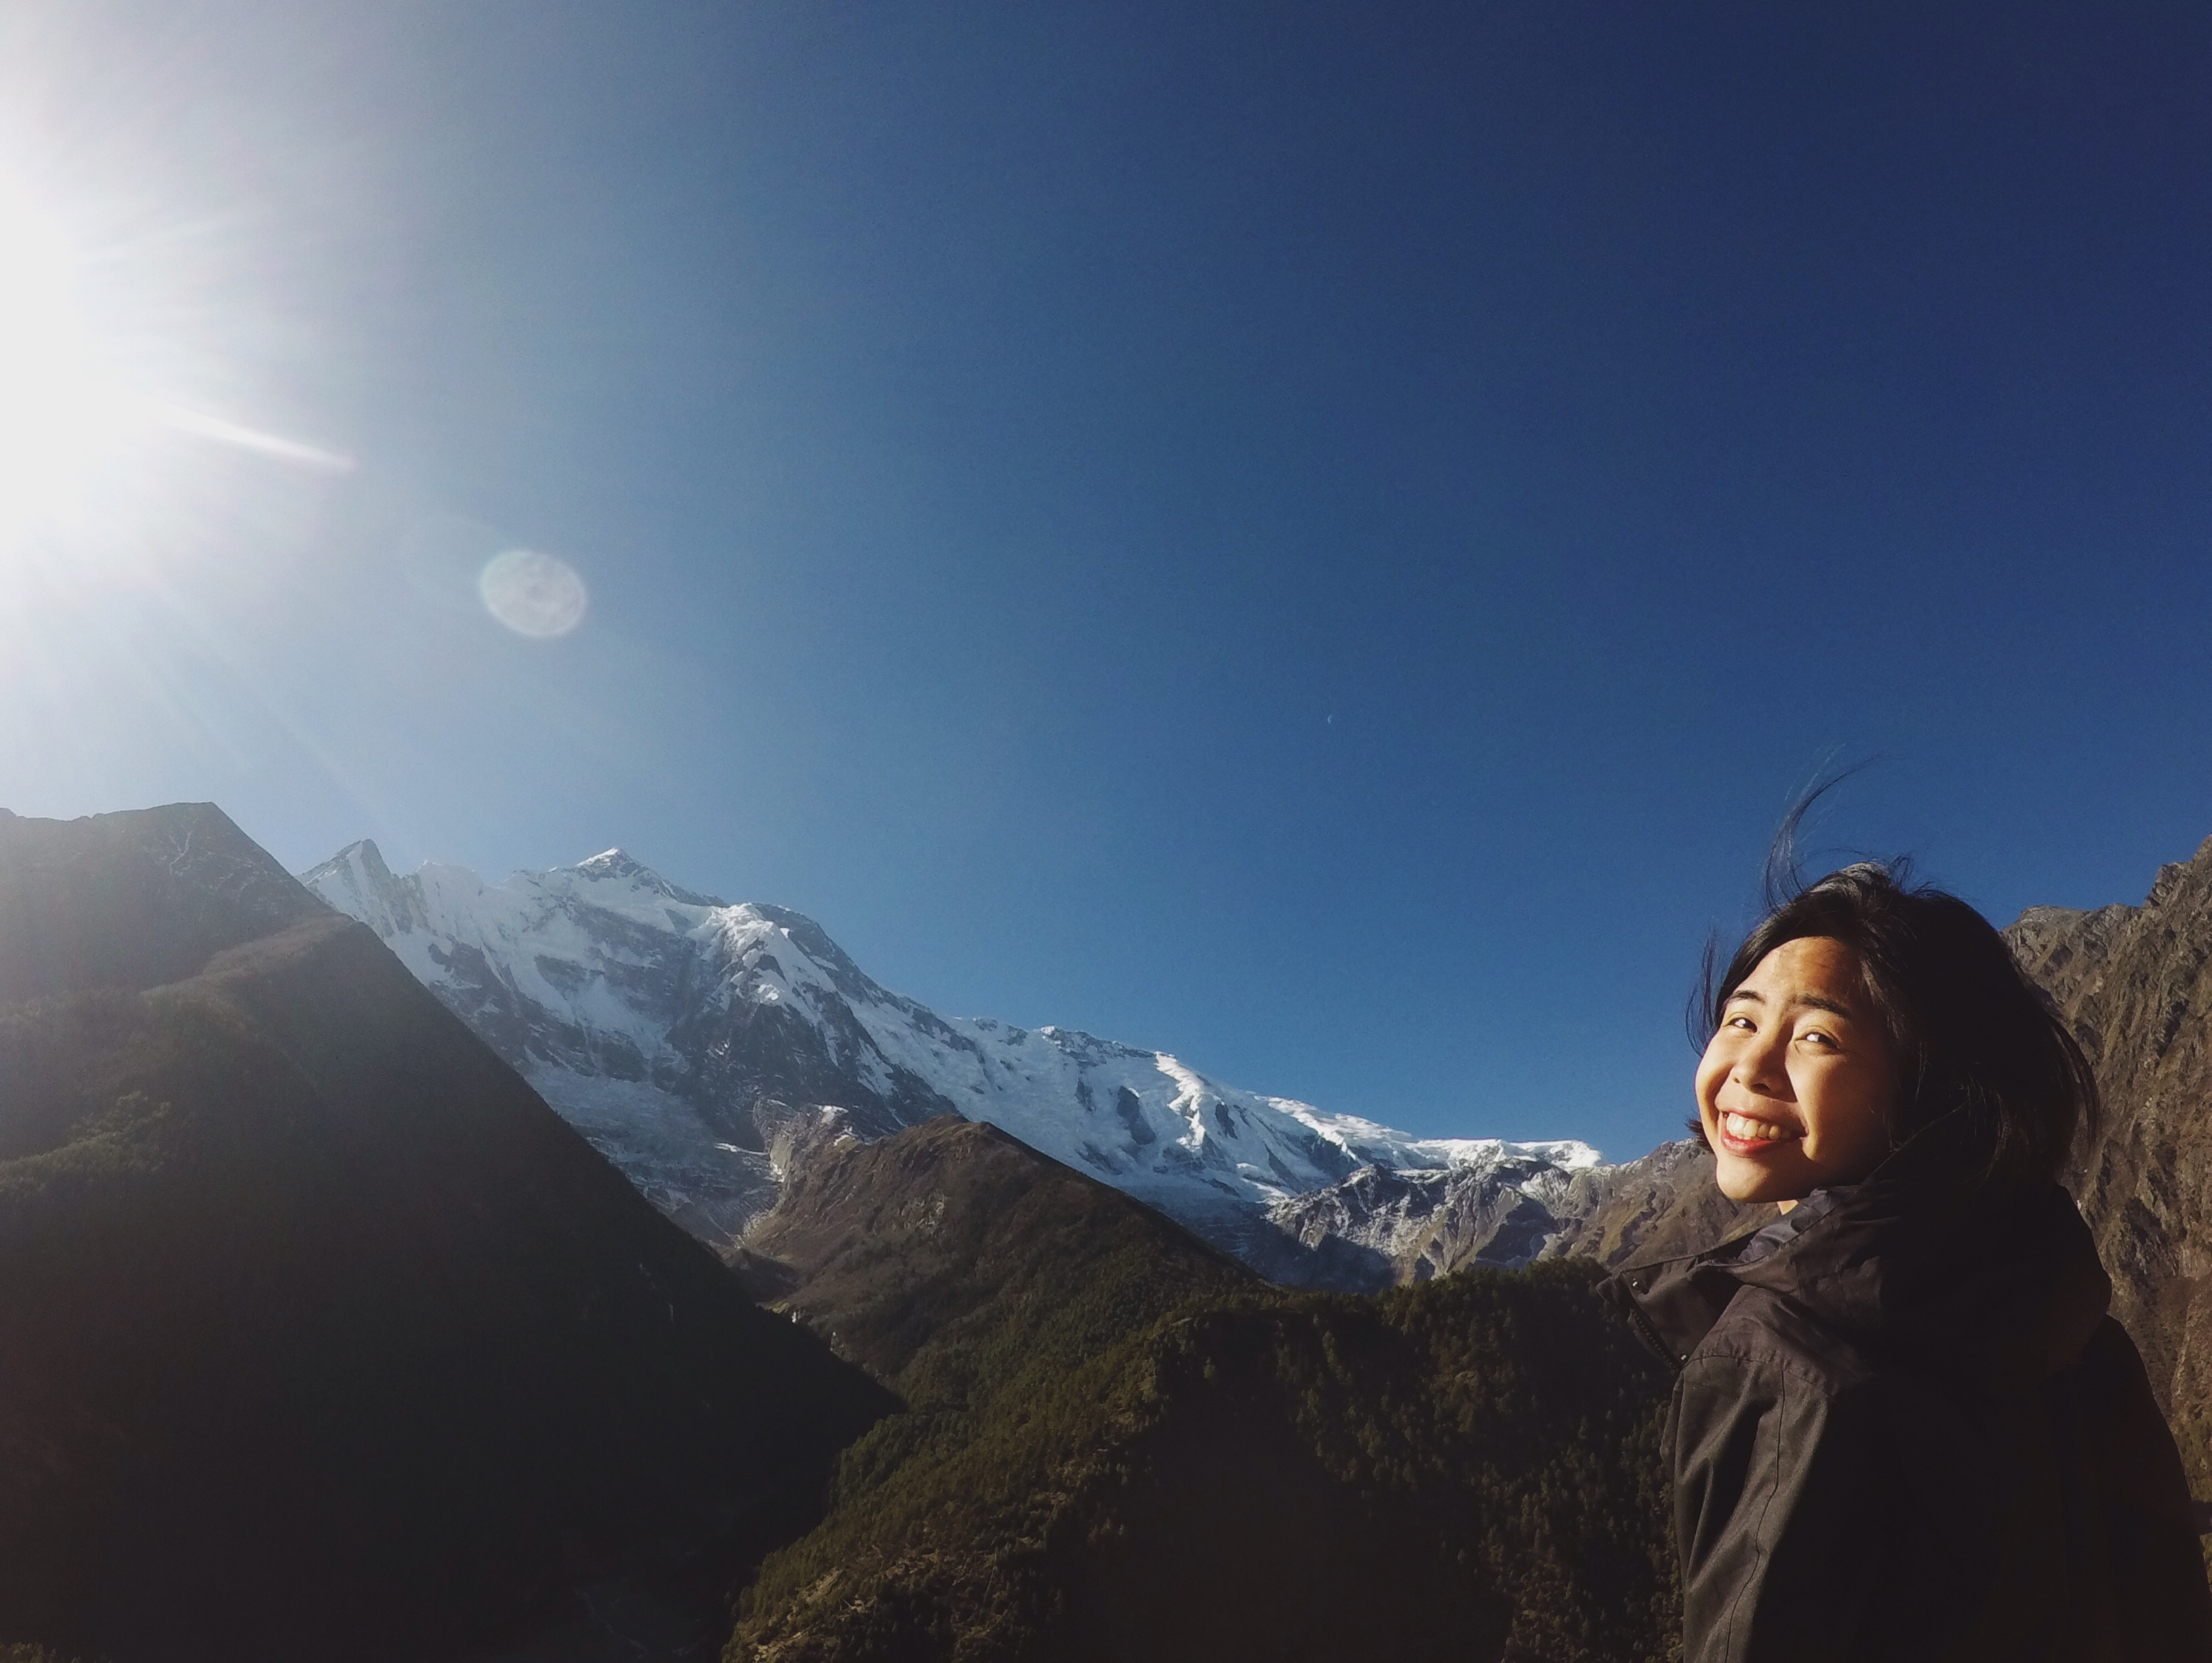 Upper Pisang, Annapurna Circuit Trek, Nepal